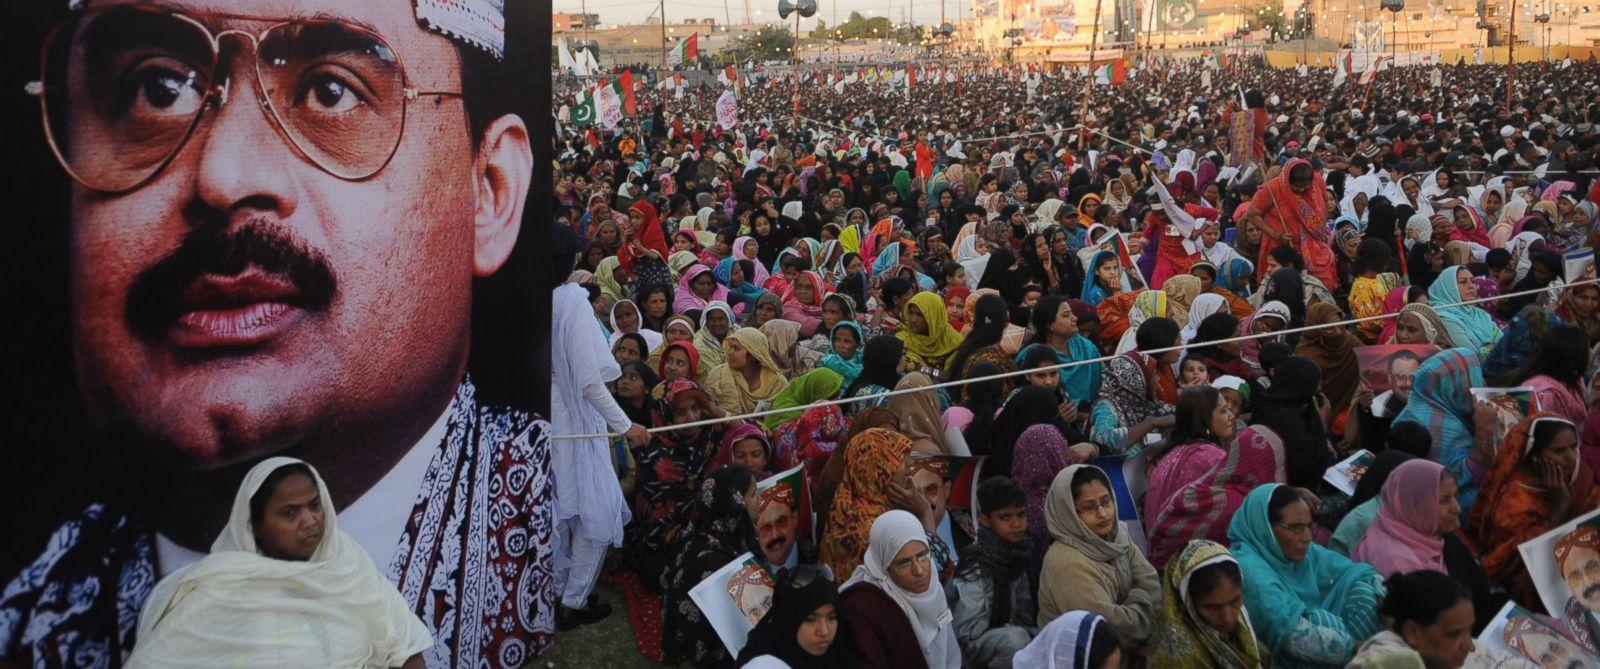 "PHOTO: Activists and supporters of Muttahida Qaumi Movement (MQM) gather during a ""Qaumi Yakjehti Jalsa"", a national unity meeting rally in Karachi, Pakistan, Jan. 30, 2011."